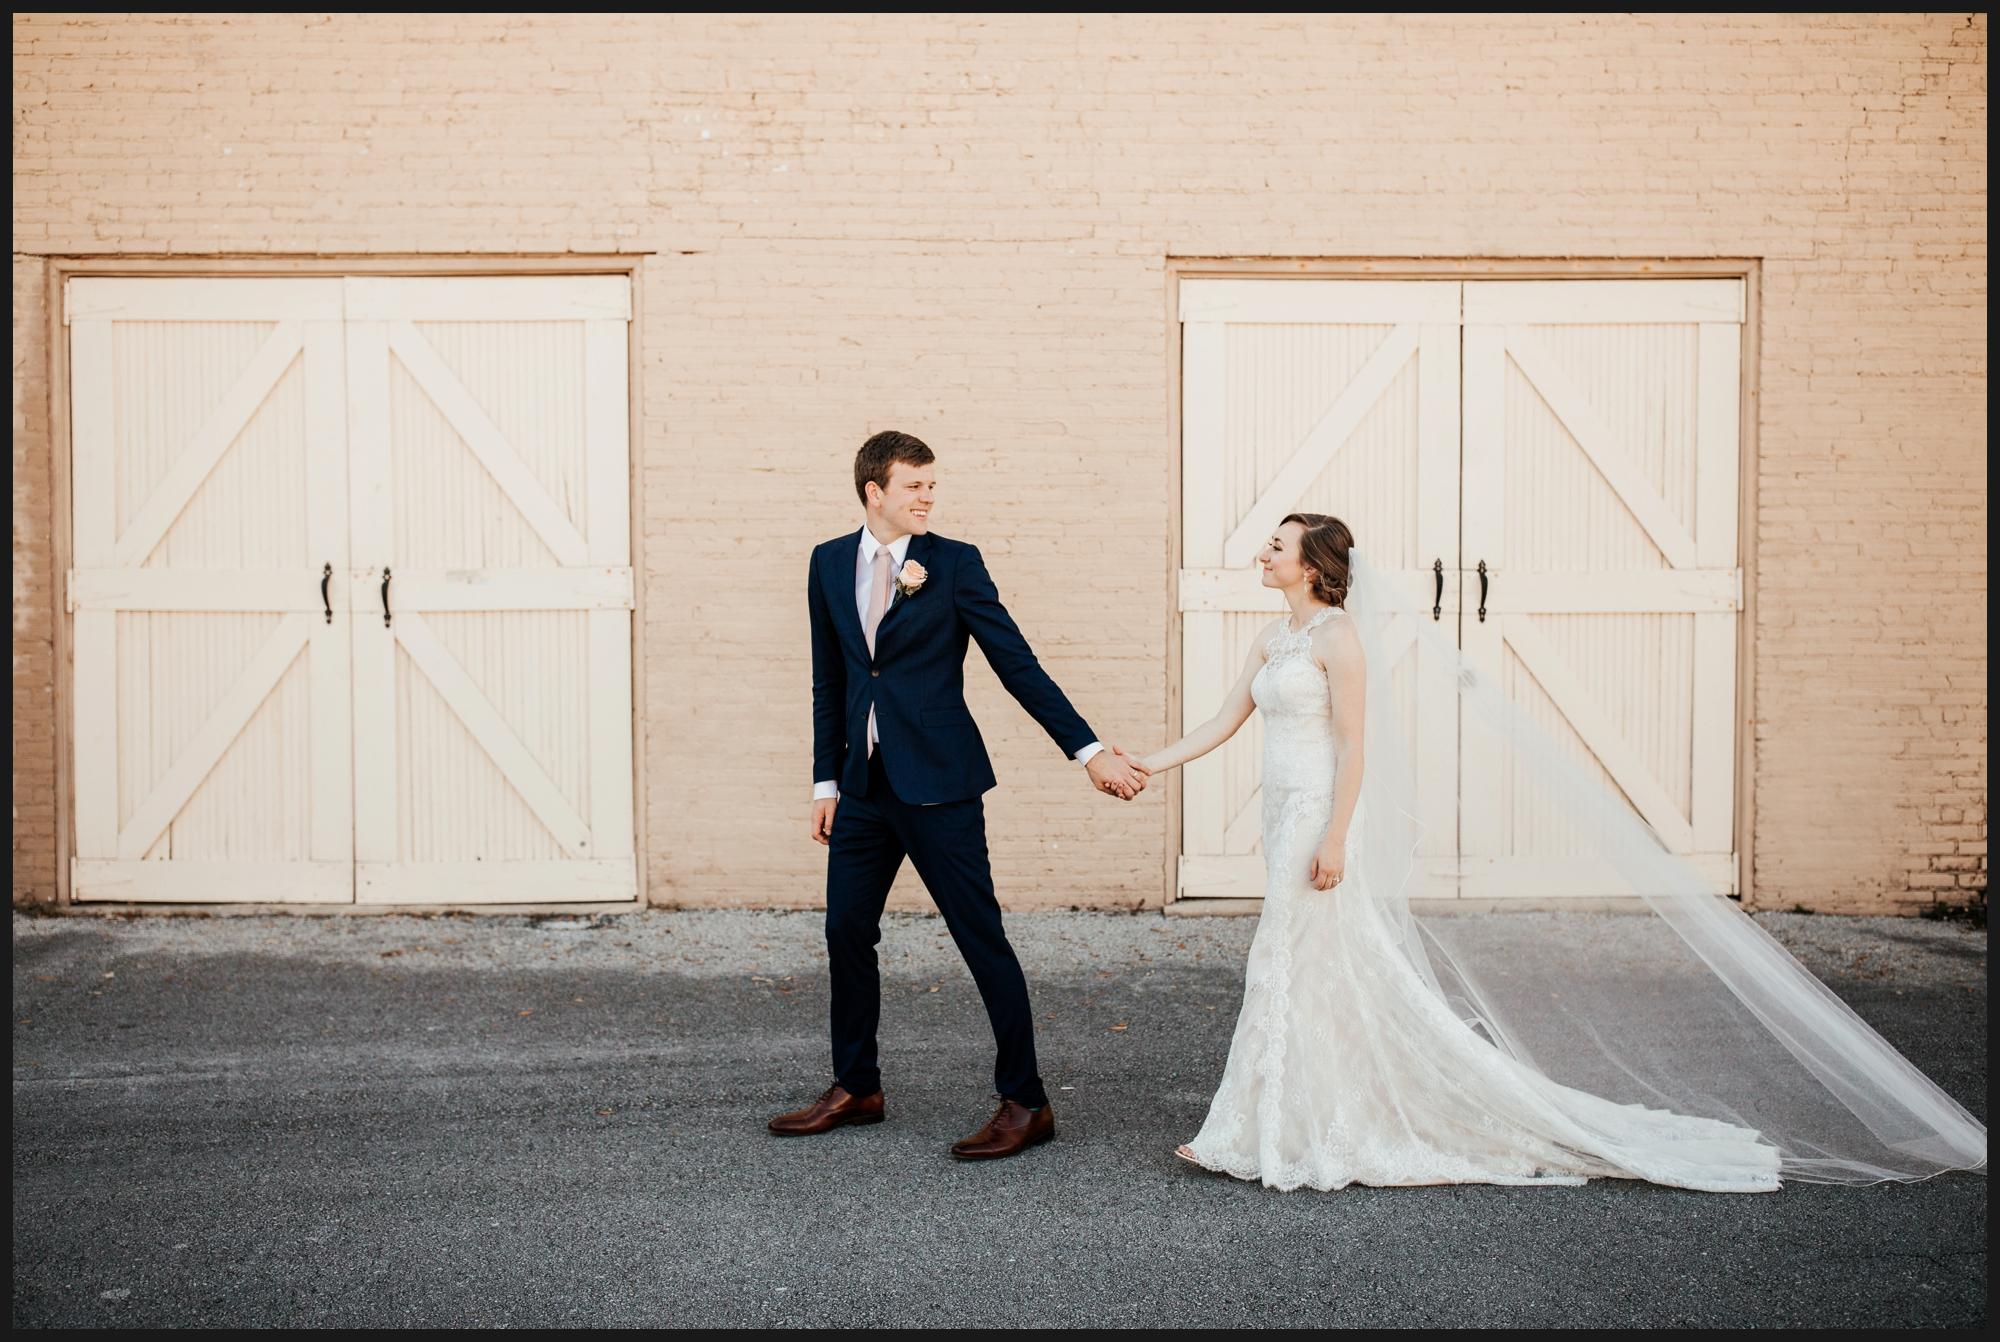 Orlando-Wedding-Photographer-destination-wedding-photographer-florida-wedding-photographer-bohemian-wedding-photographer_1765.jpg